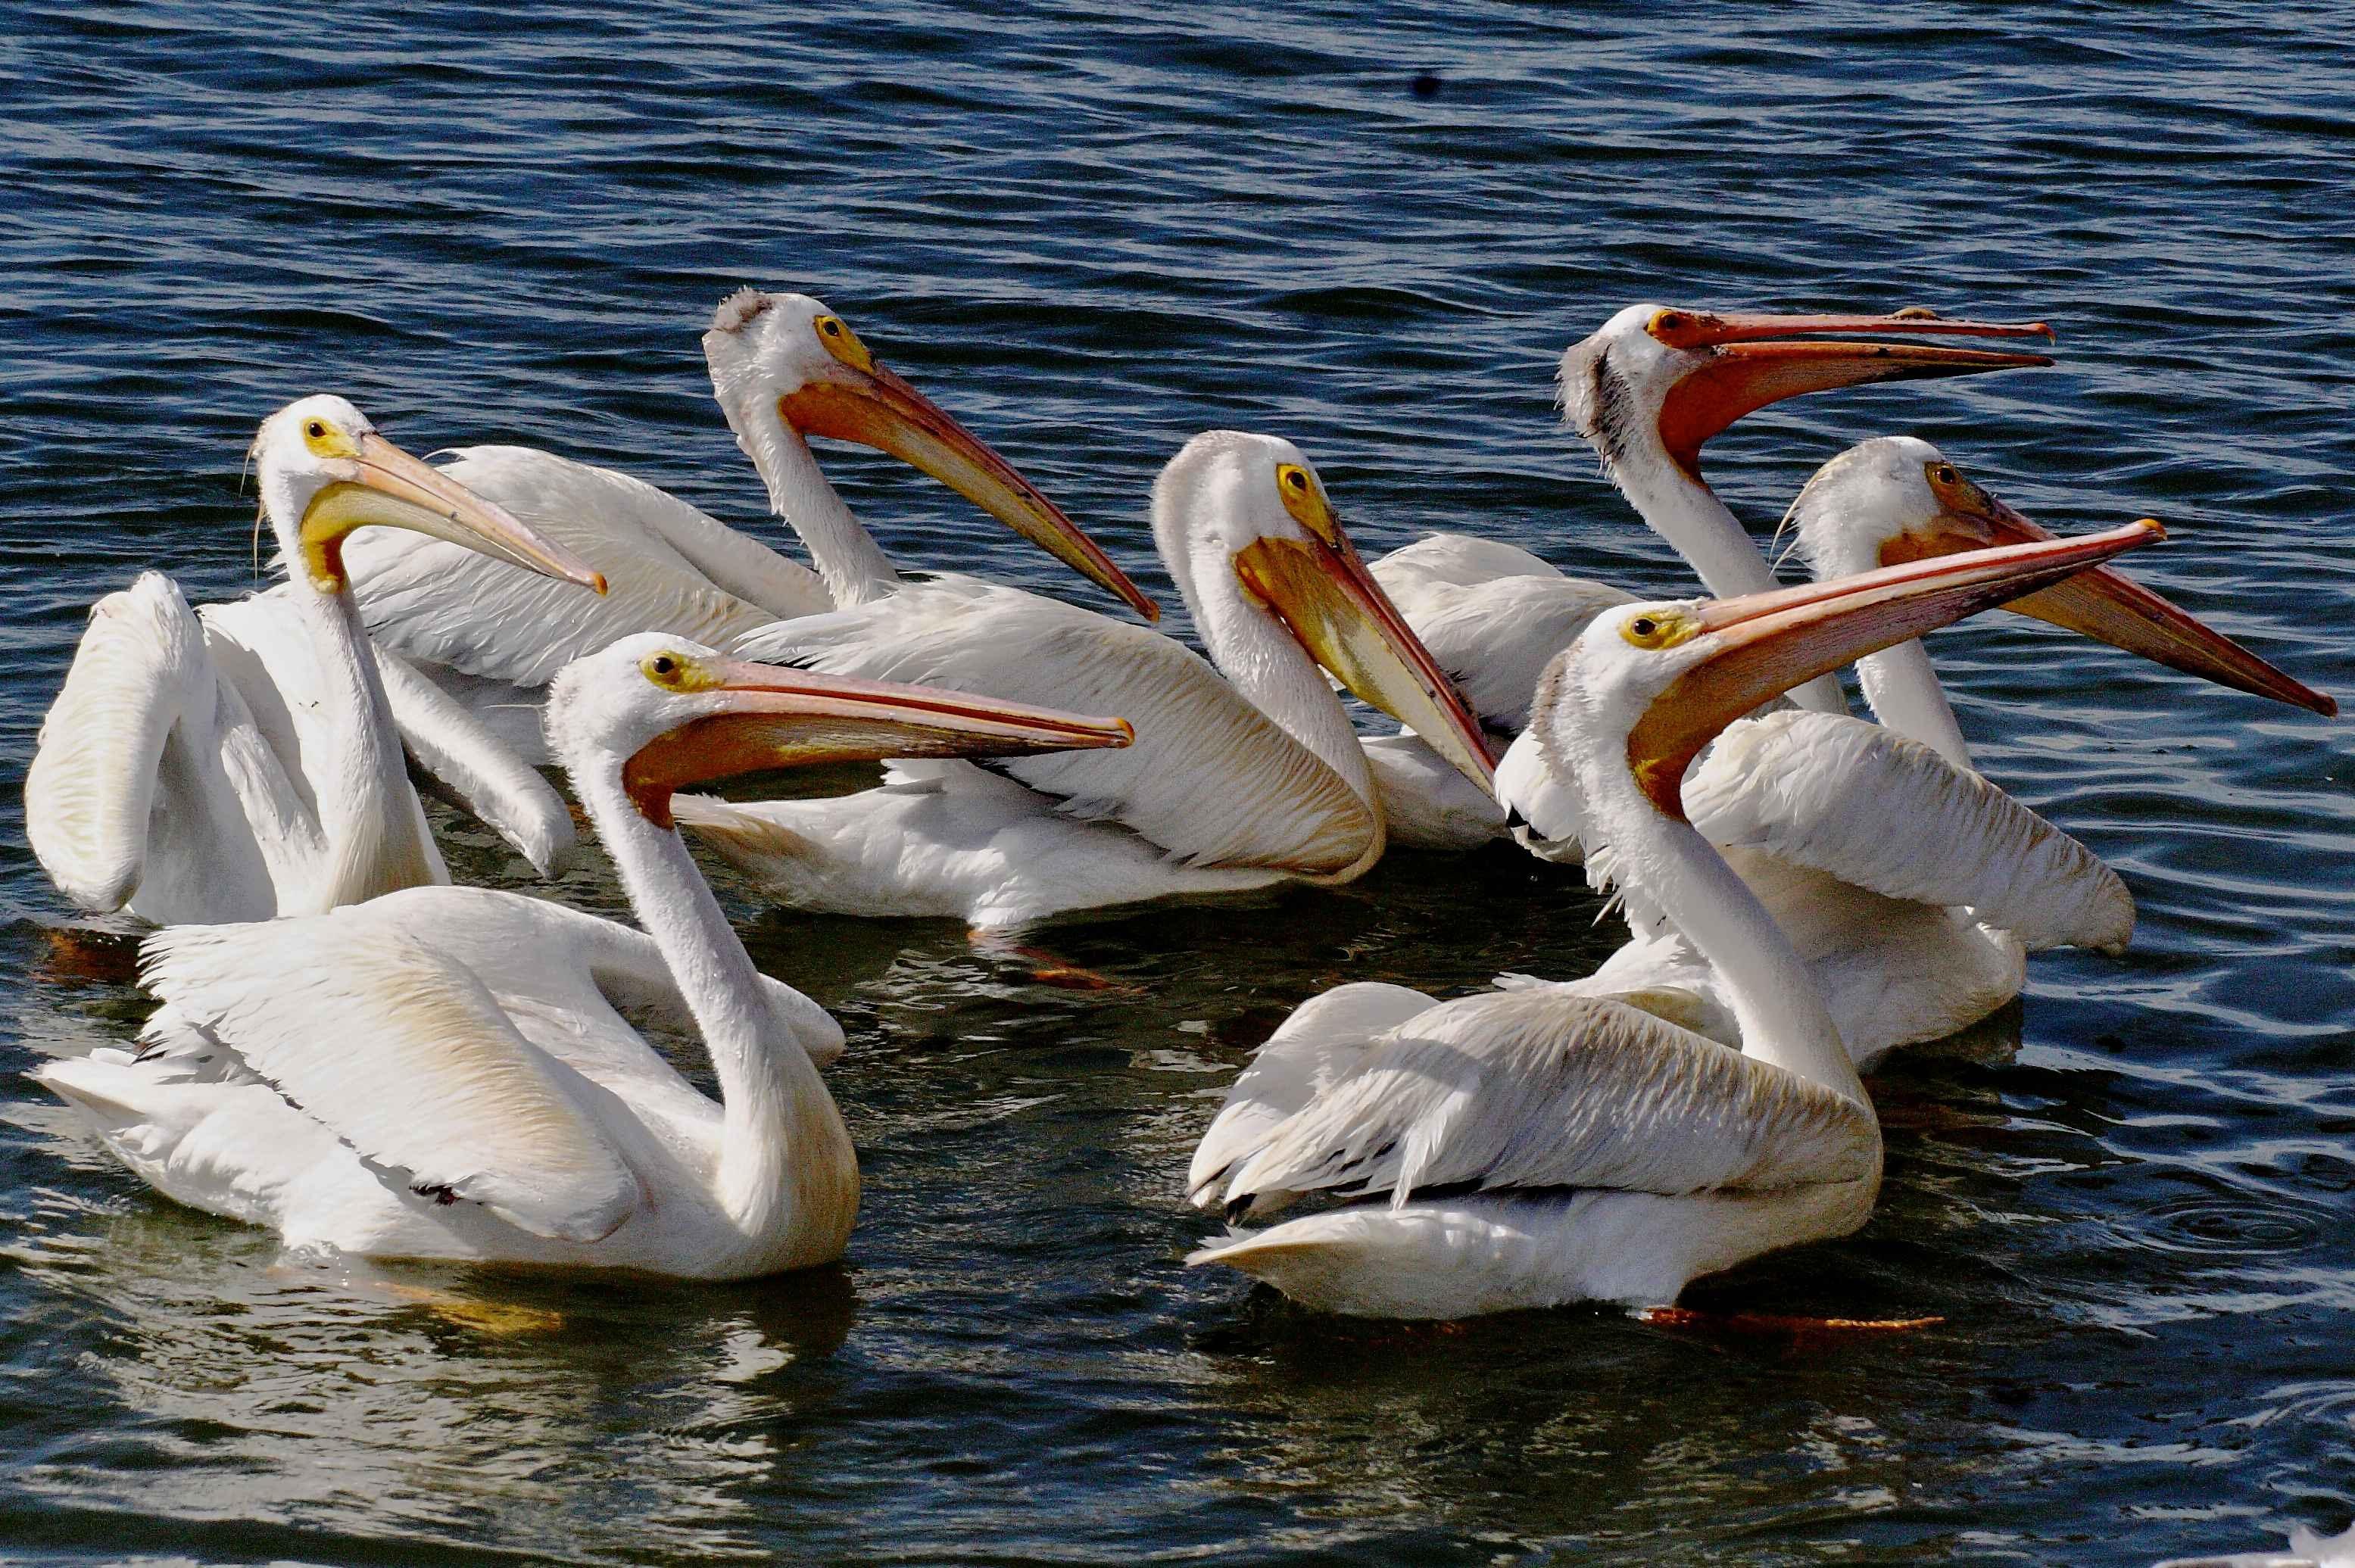 Bird White Pelican Seabird Wildlife Beak Aerial Fauna Birds American Animals Vertebrate Pelecaniformes